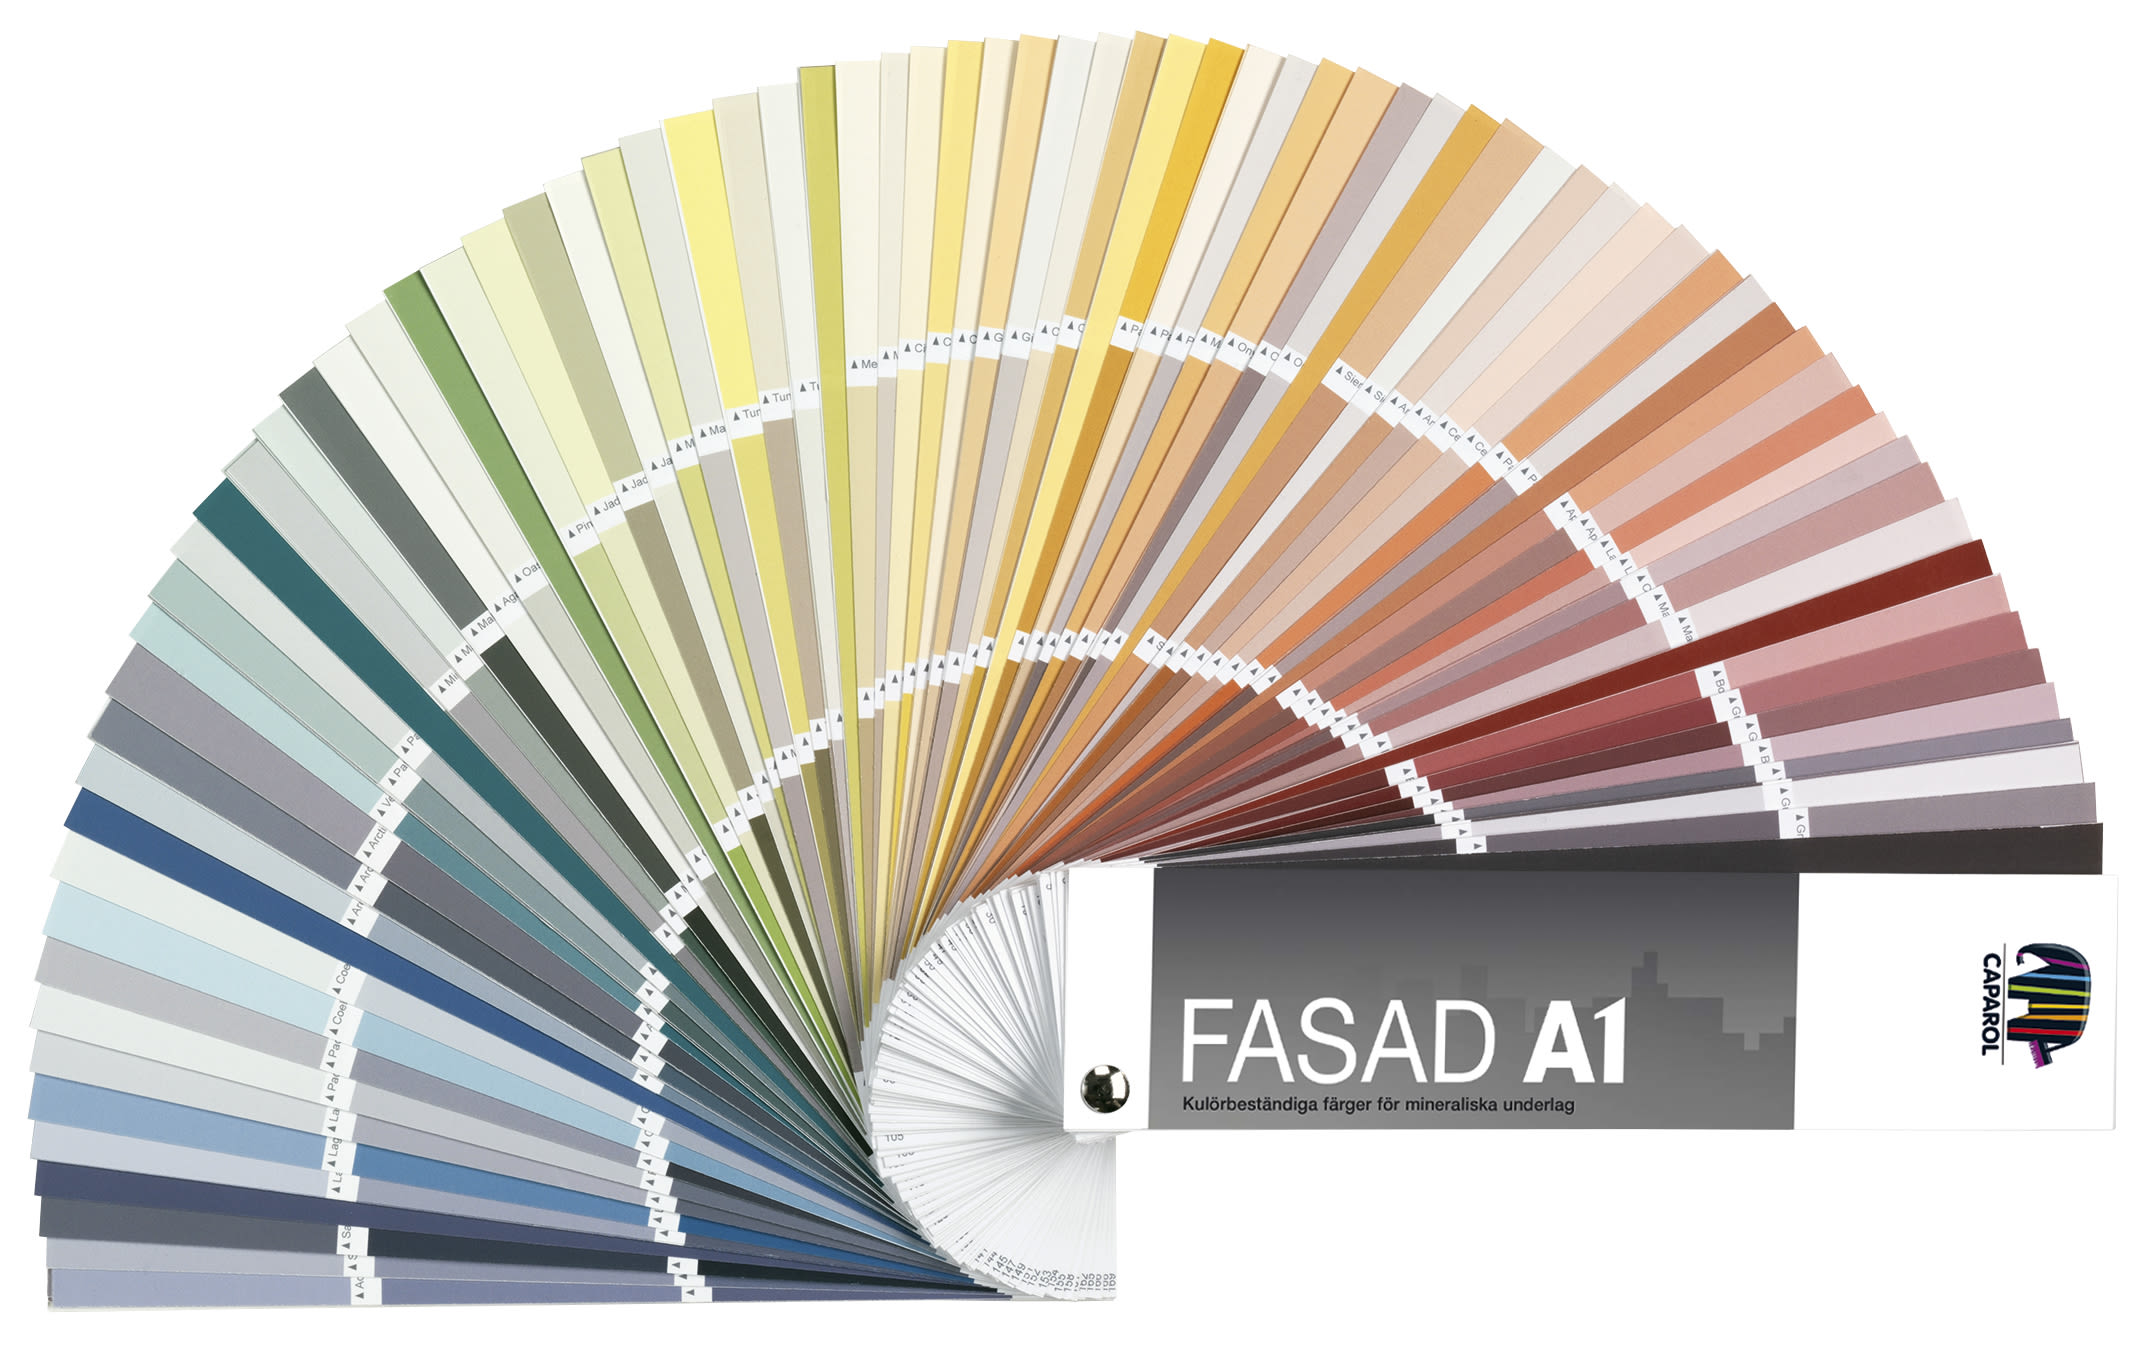 fasad a1 f rgkarta f r putsfasader caparol f rg. Black Bedroom Furniture Sets. Home Design Ideas